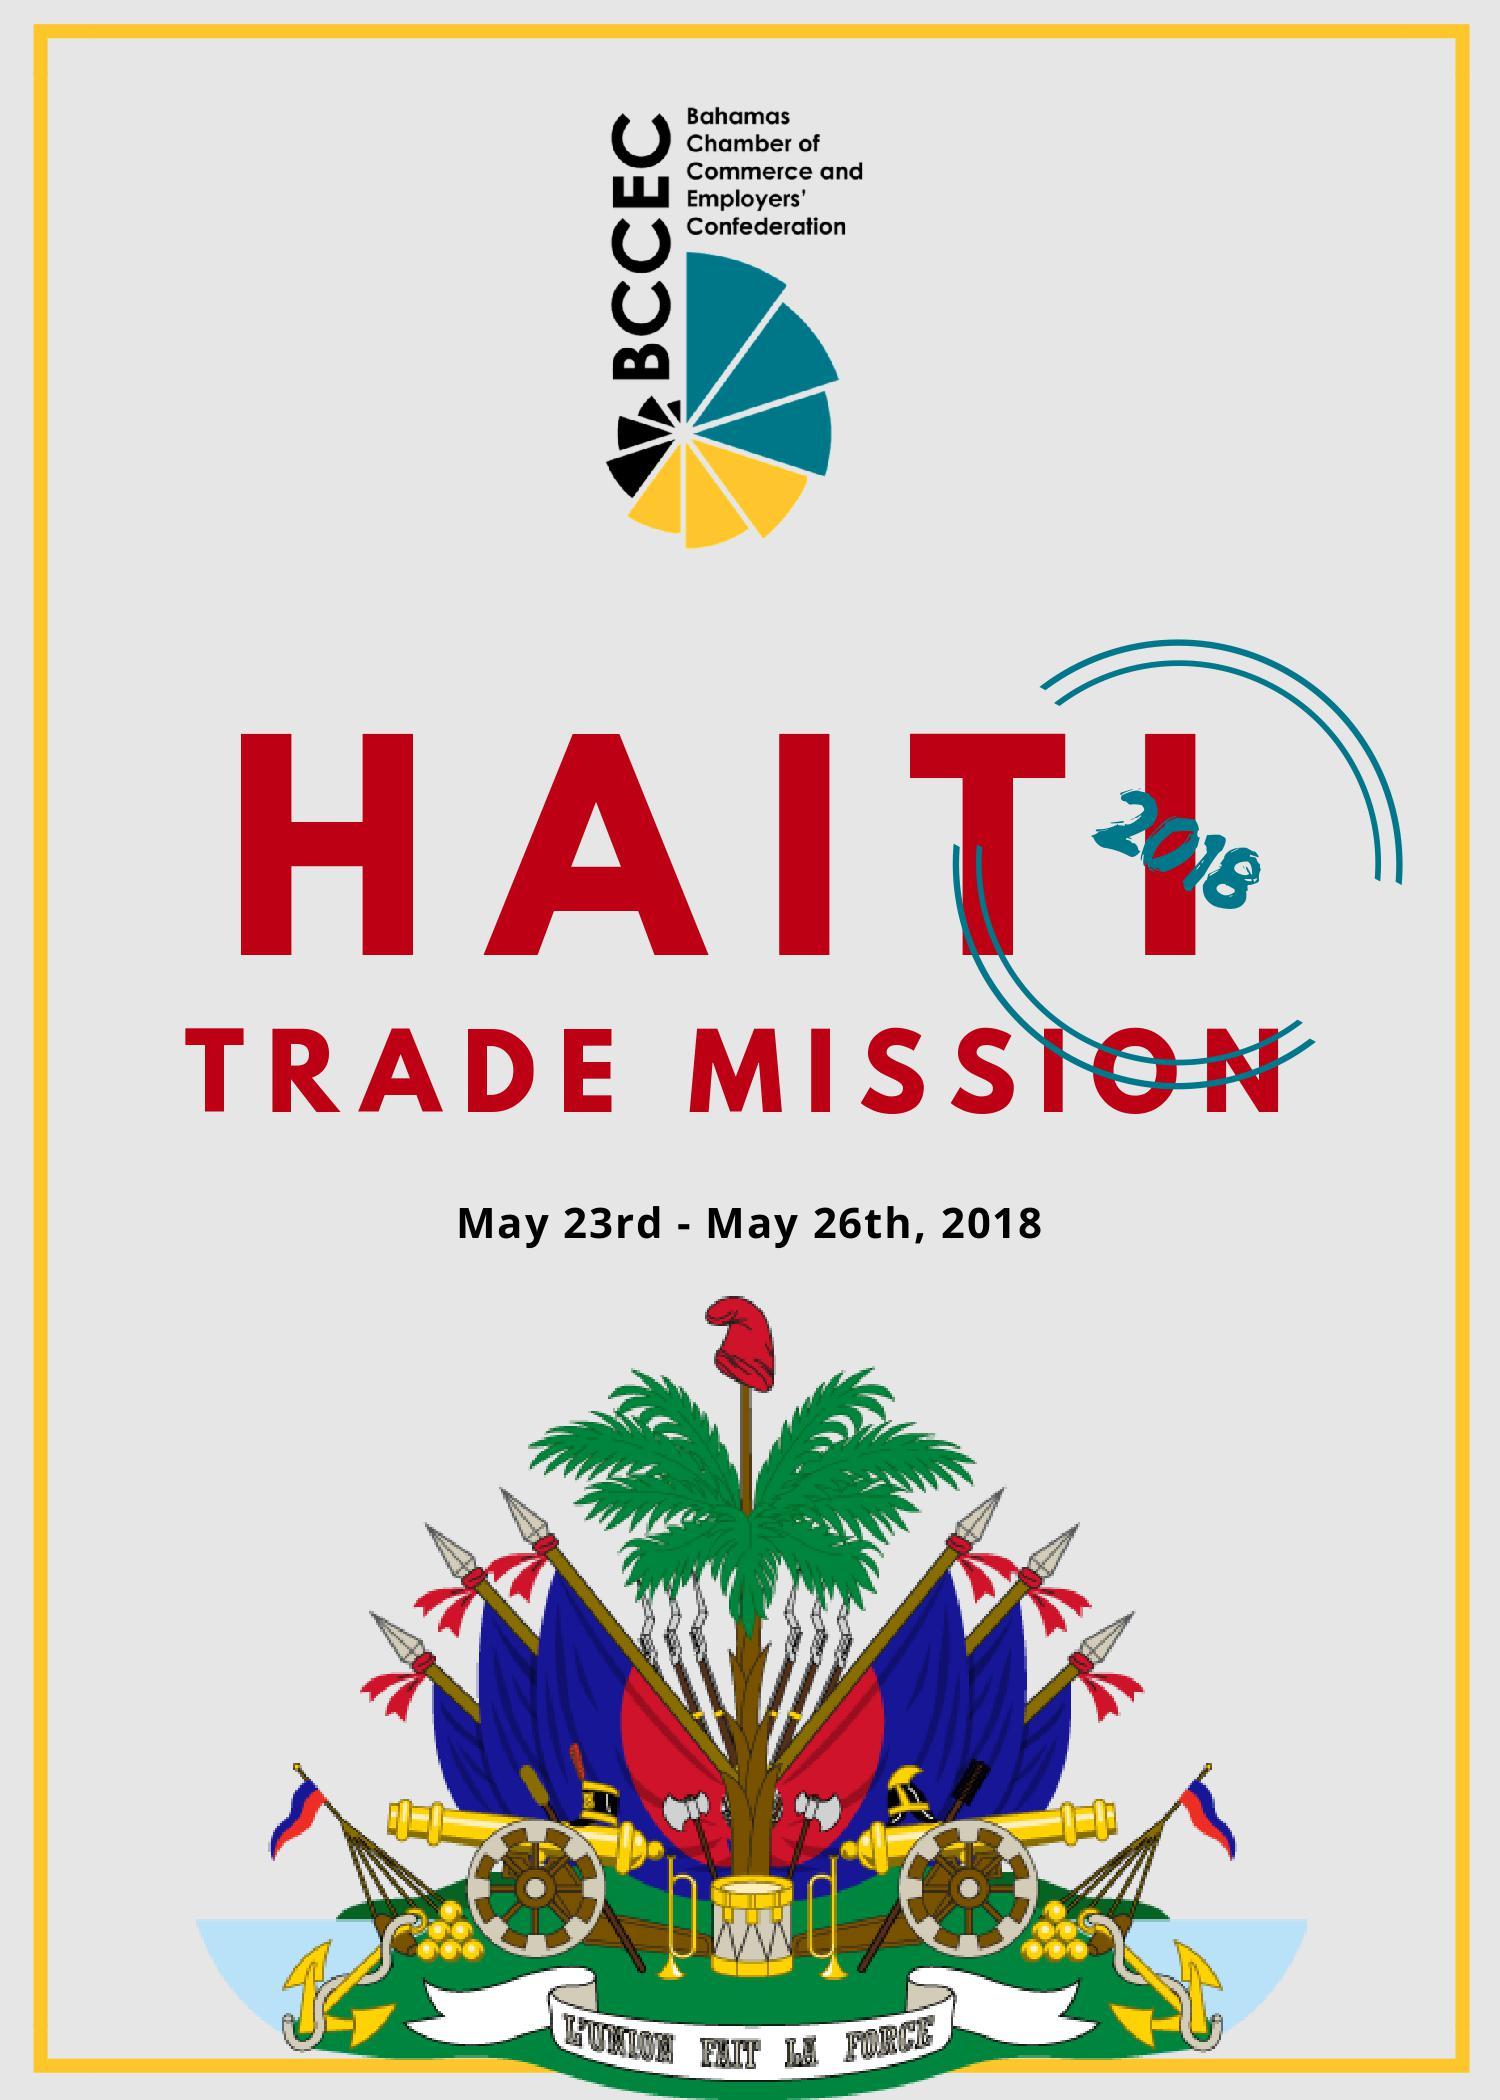 Haiti Trade Mission Flyer